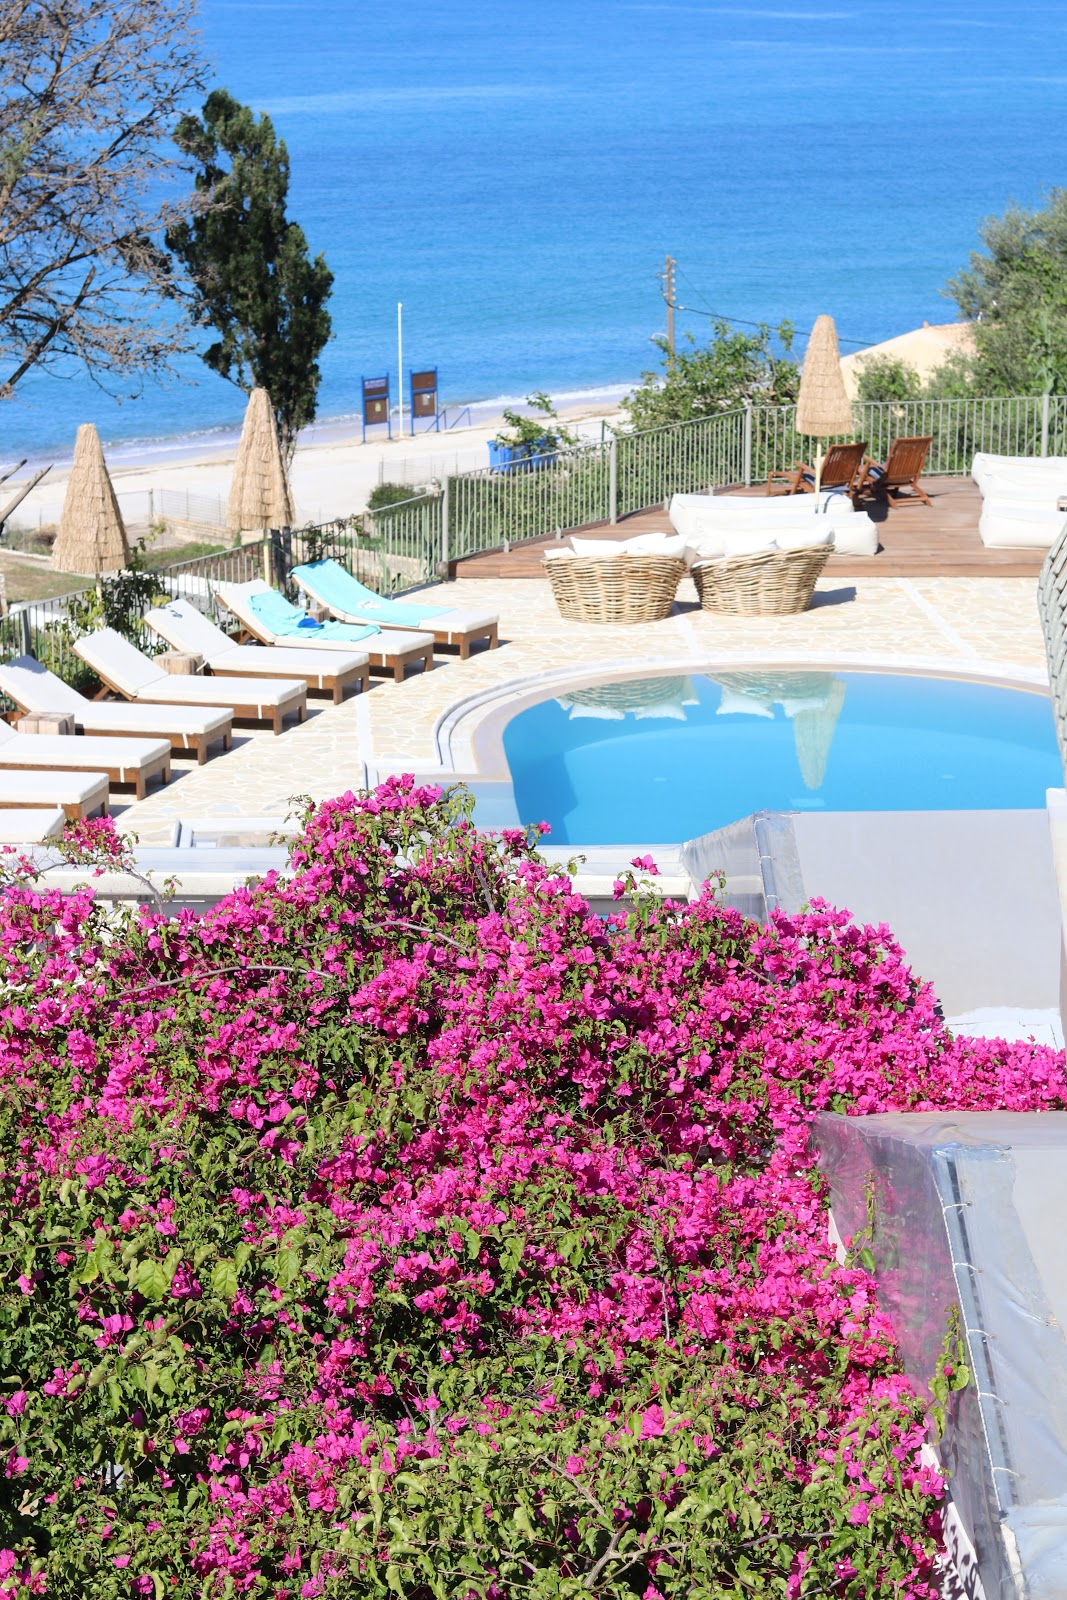 Outdoor pool with flowers, F Zeen Resort, Unique Villas, Kefalonia